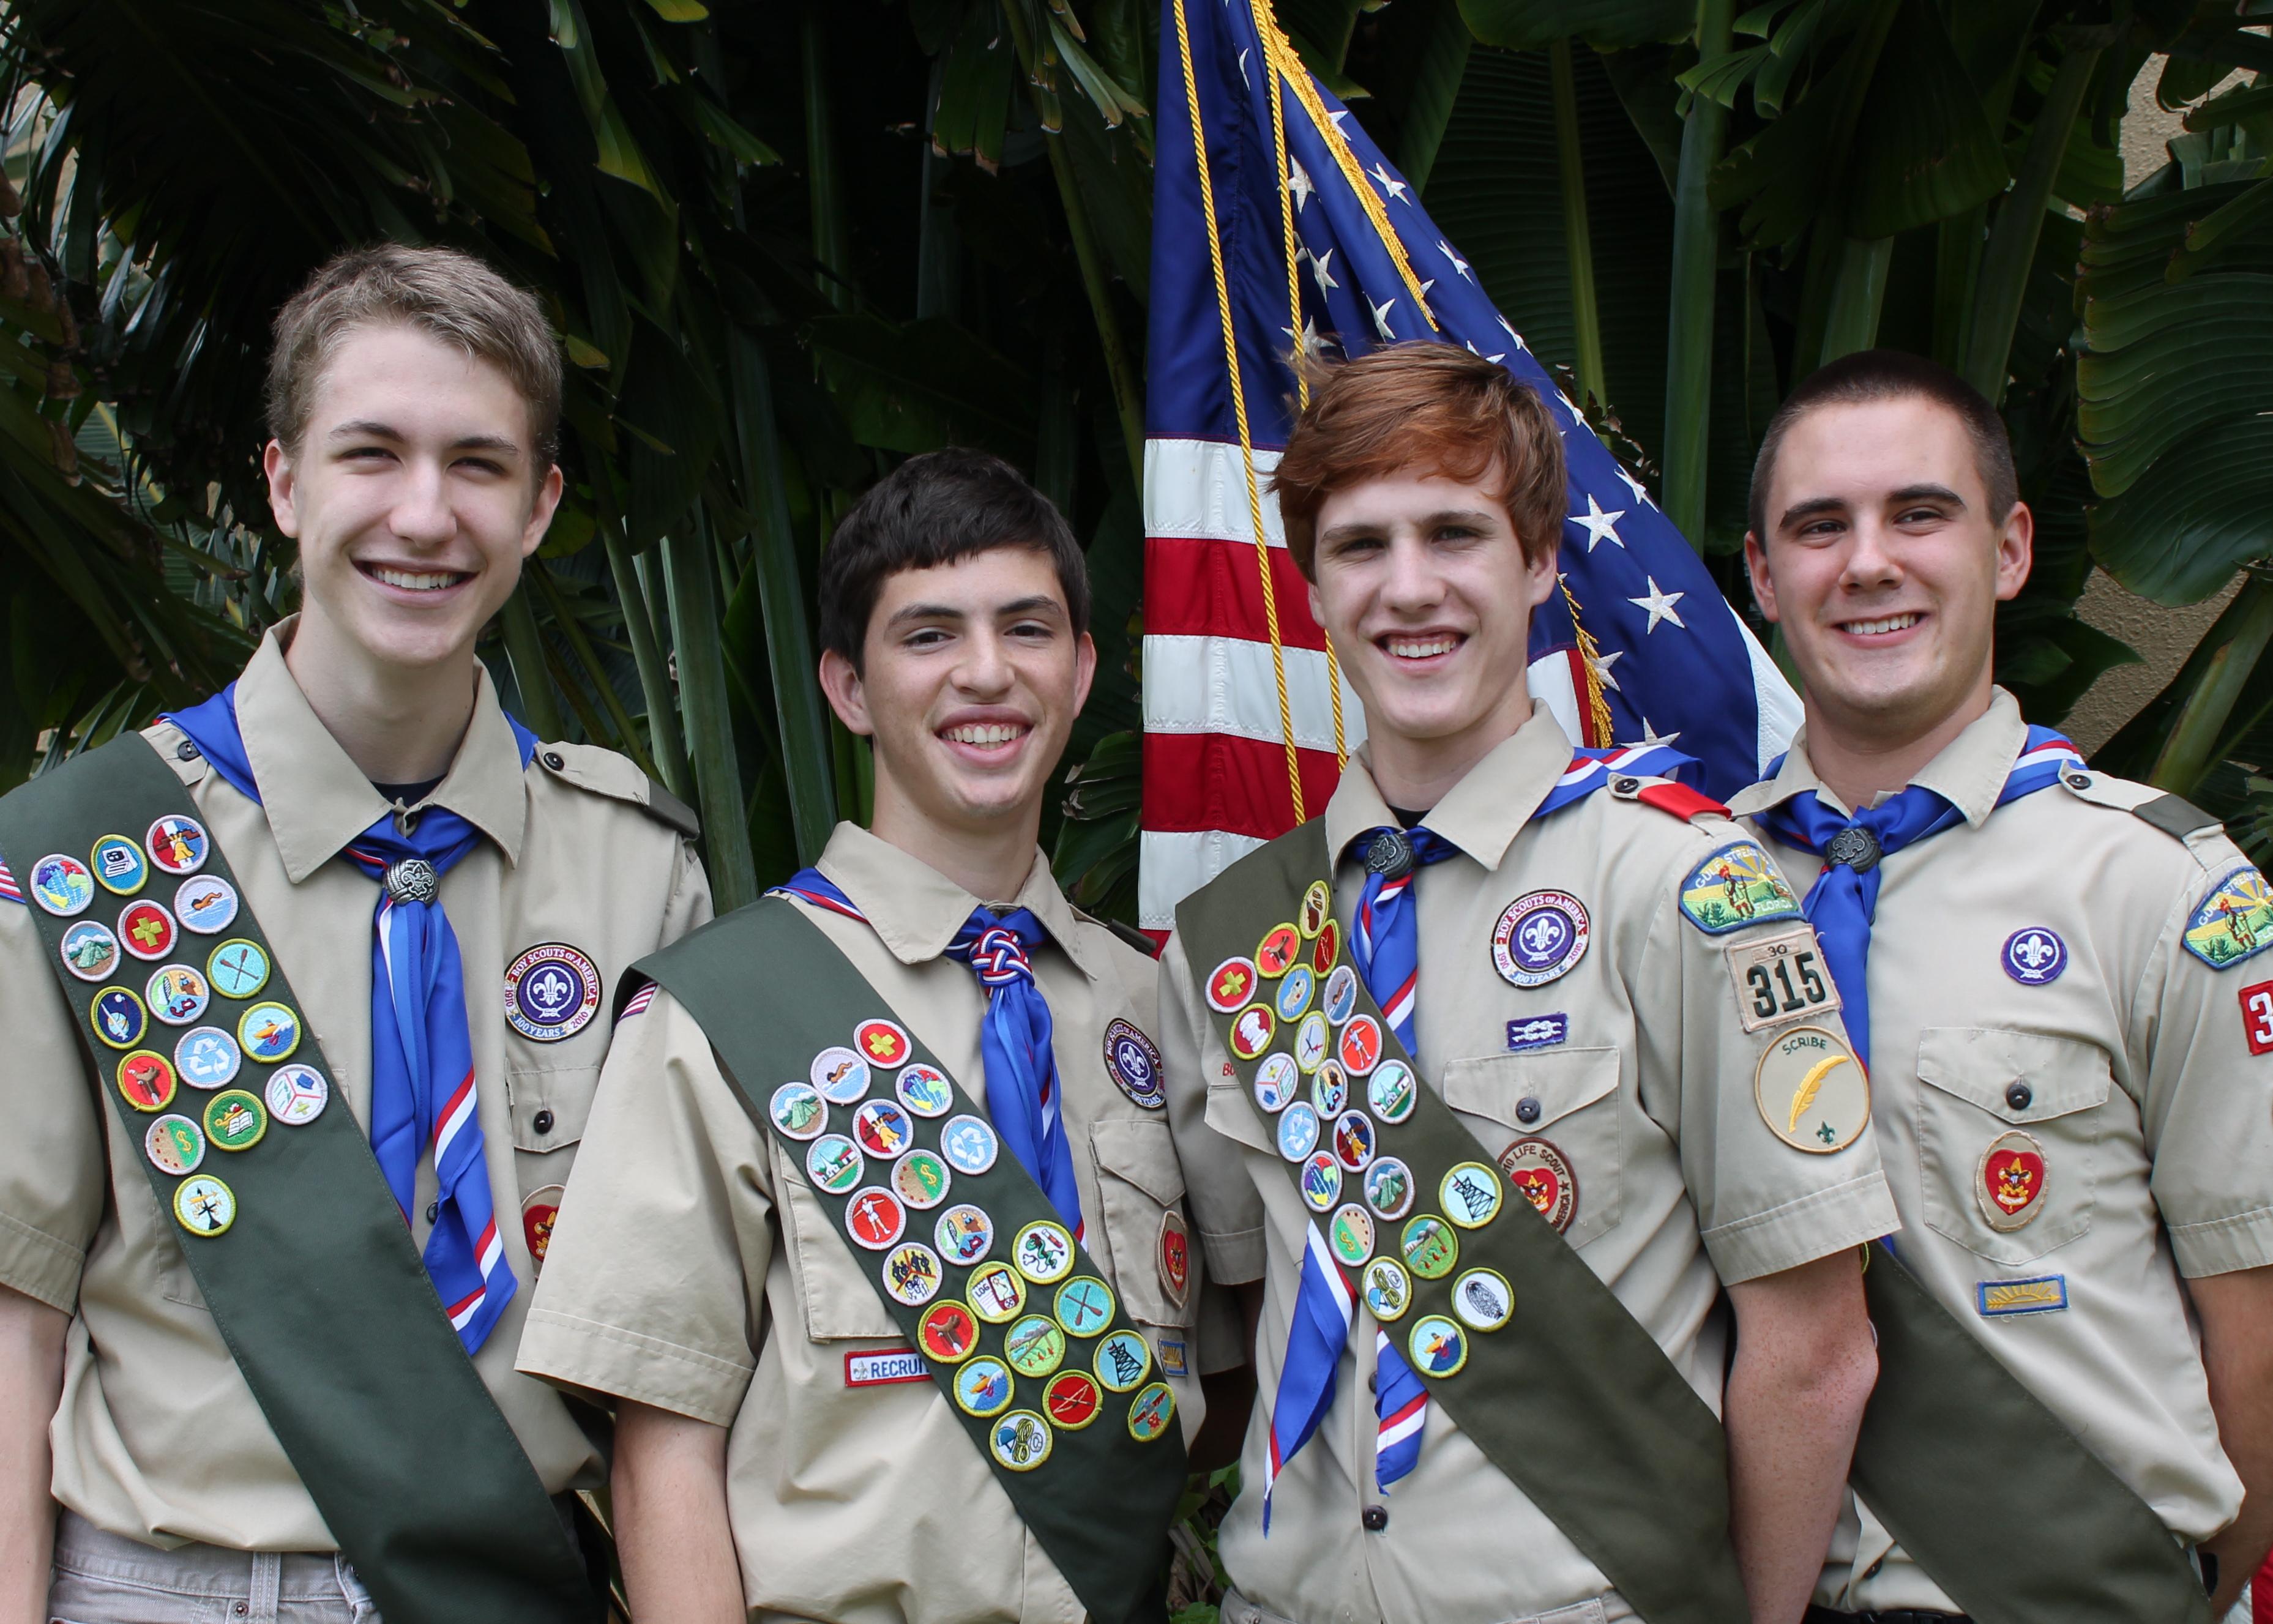 Boca Raton Eagle Scouts 2012